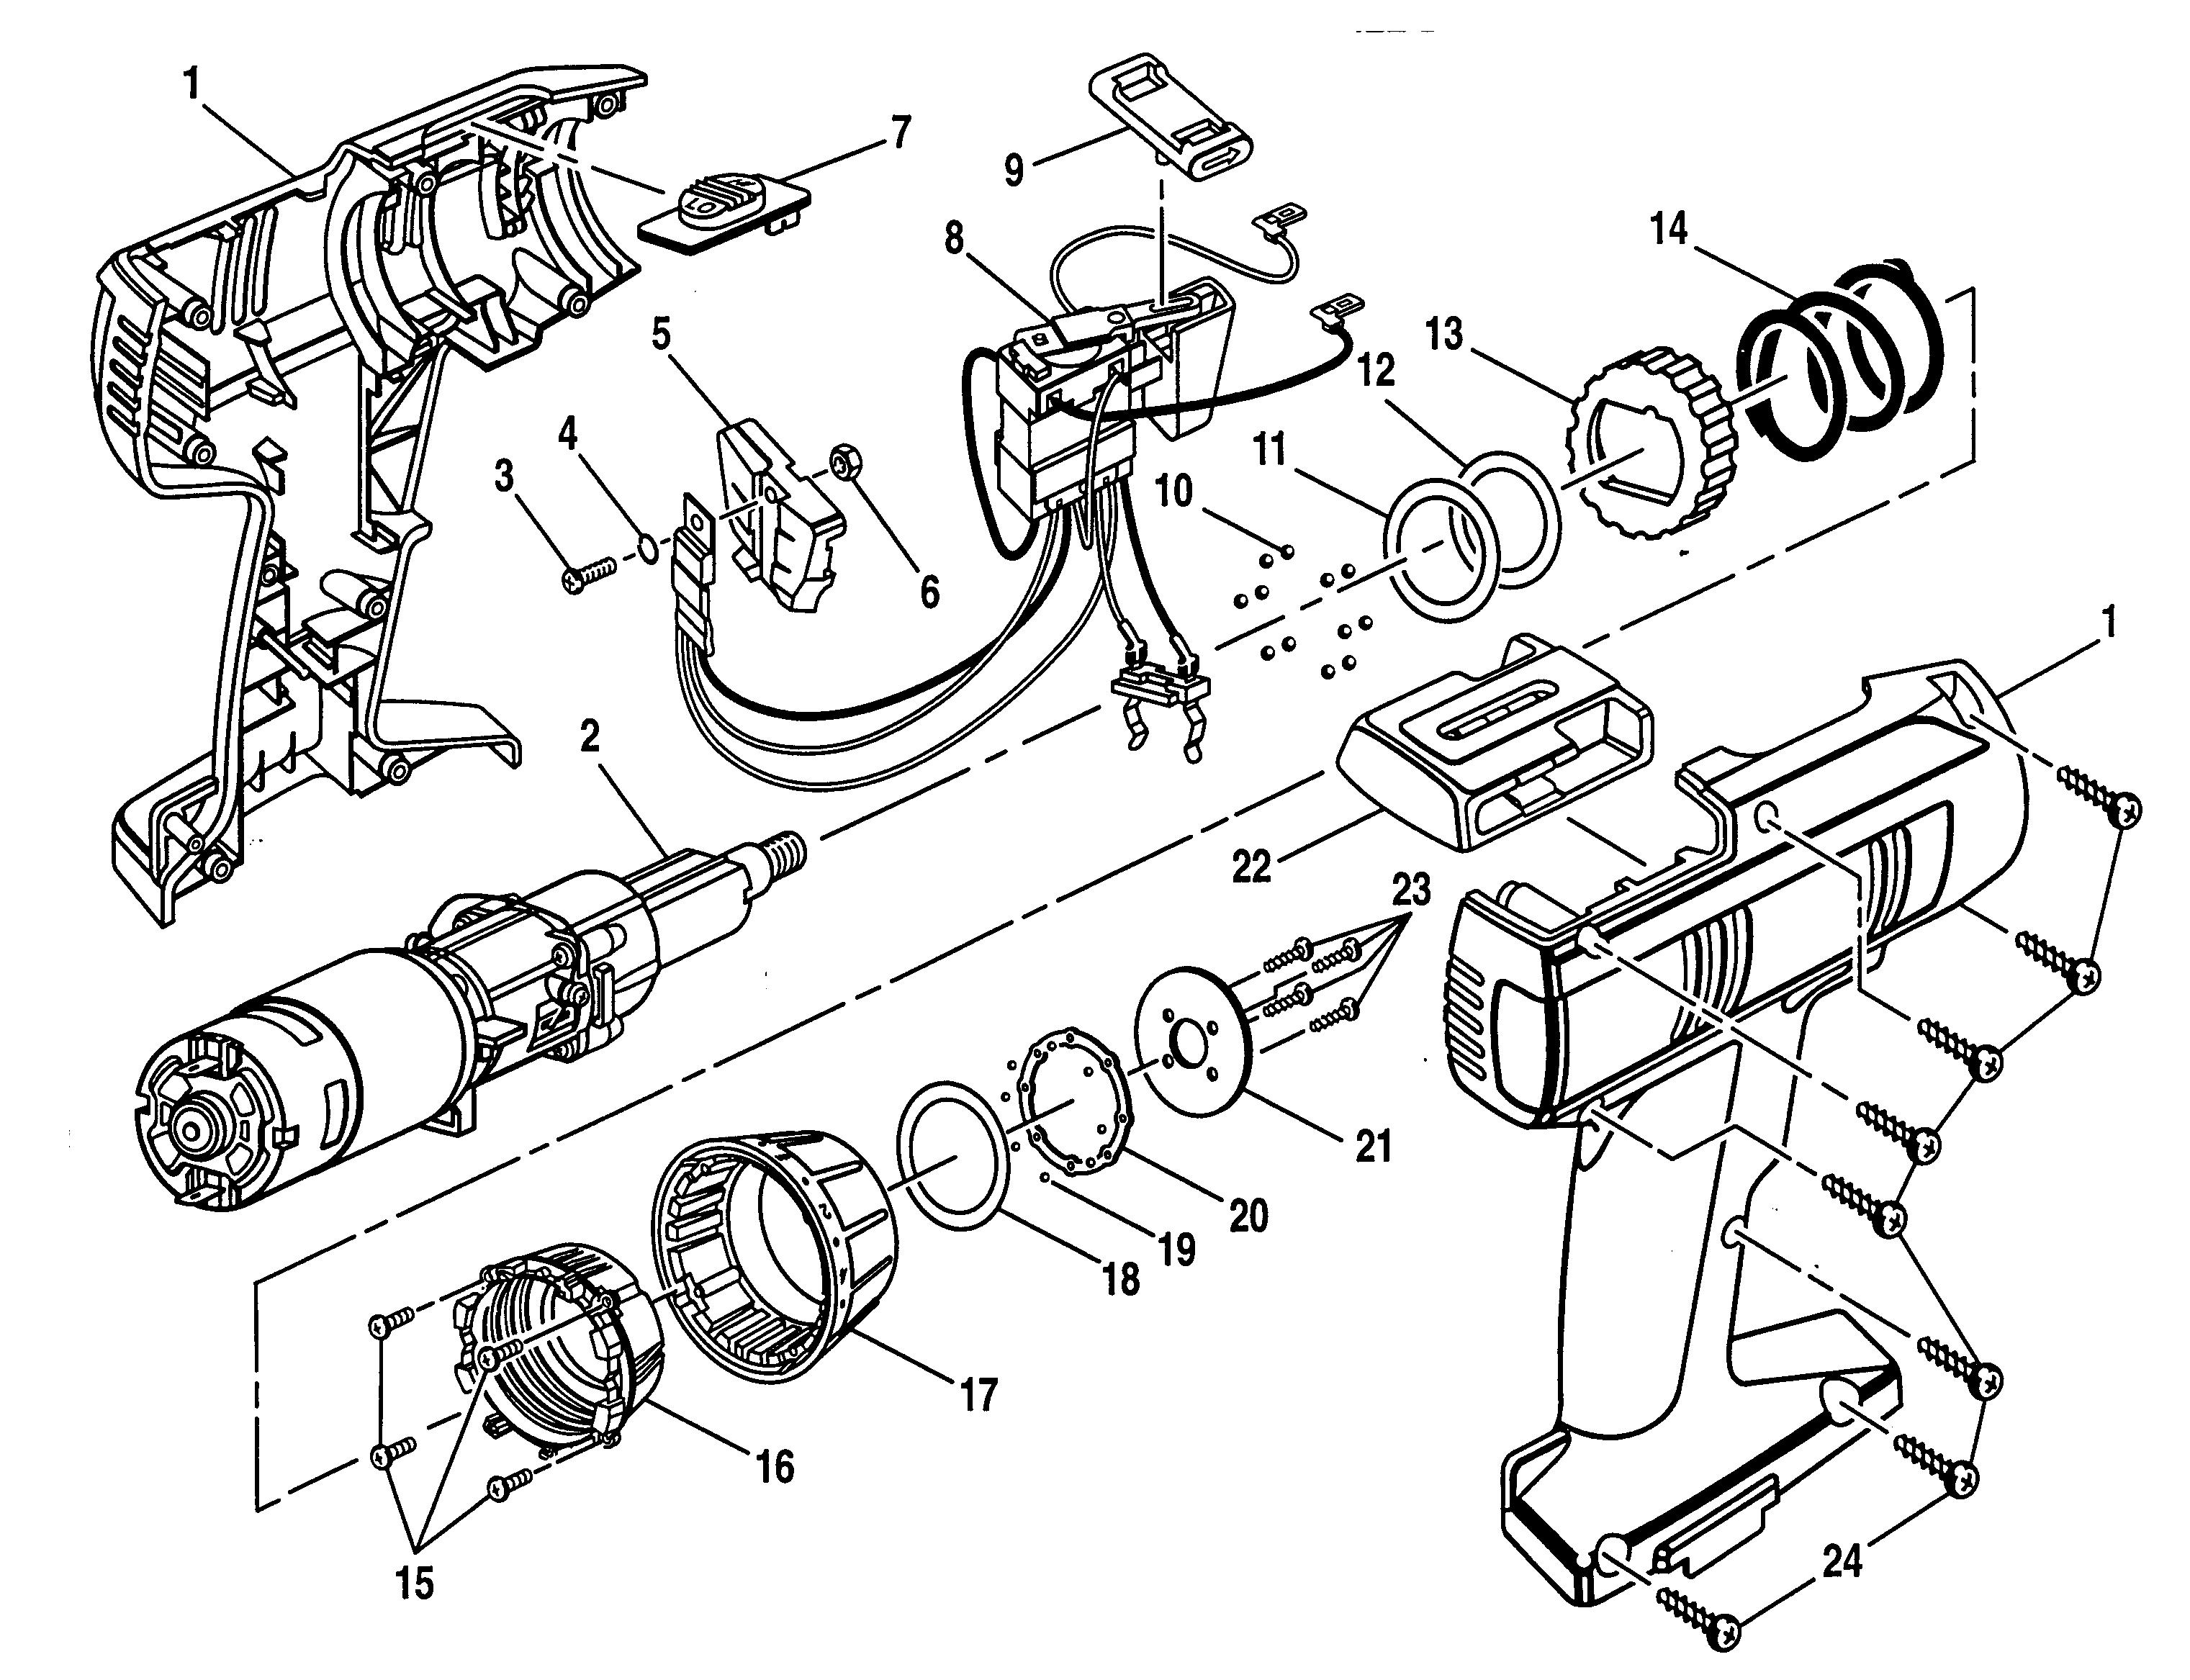 Craftsman model 973271351 drill driver genuine parts